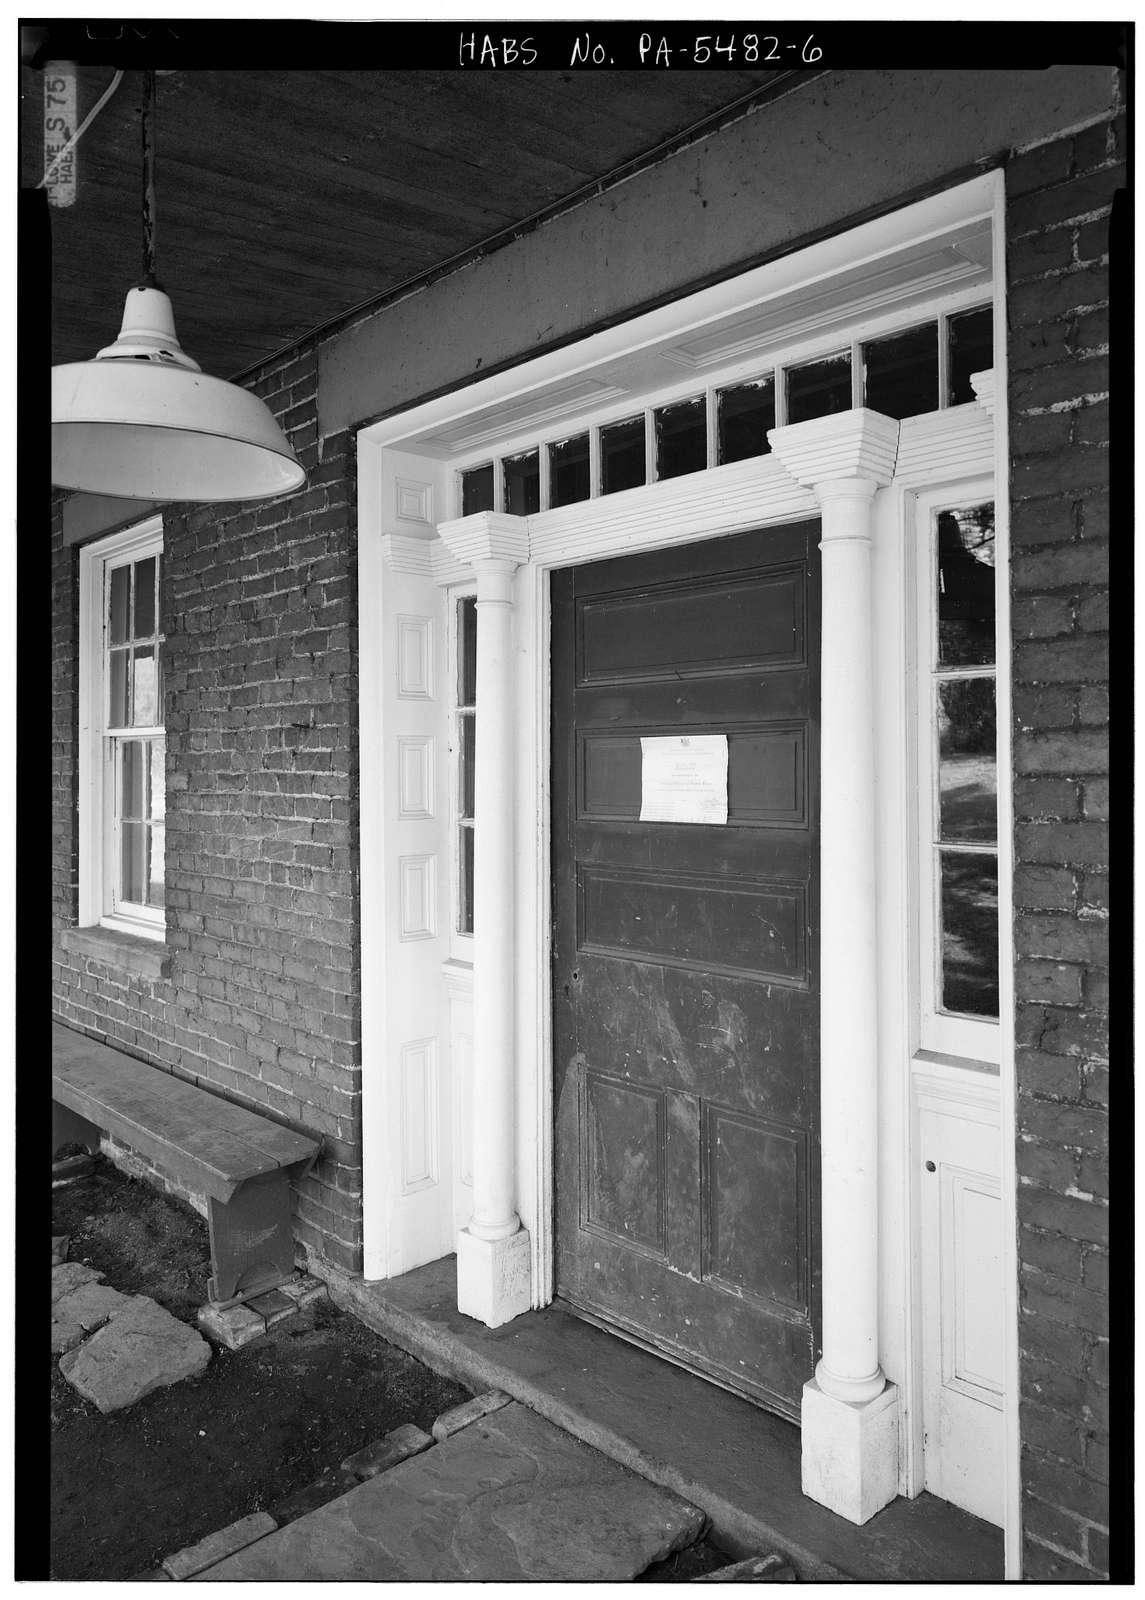 Levi Springer House, Fan Hollow Road, Uniontown, Fayette County, PA